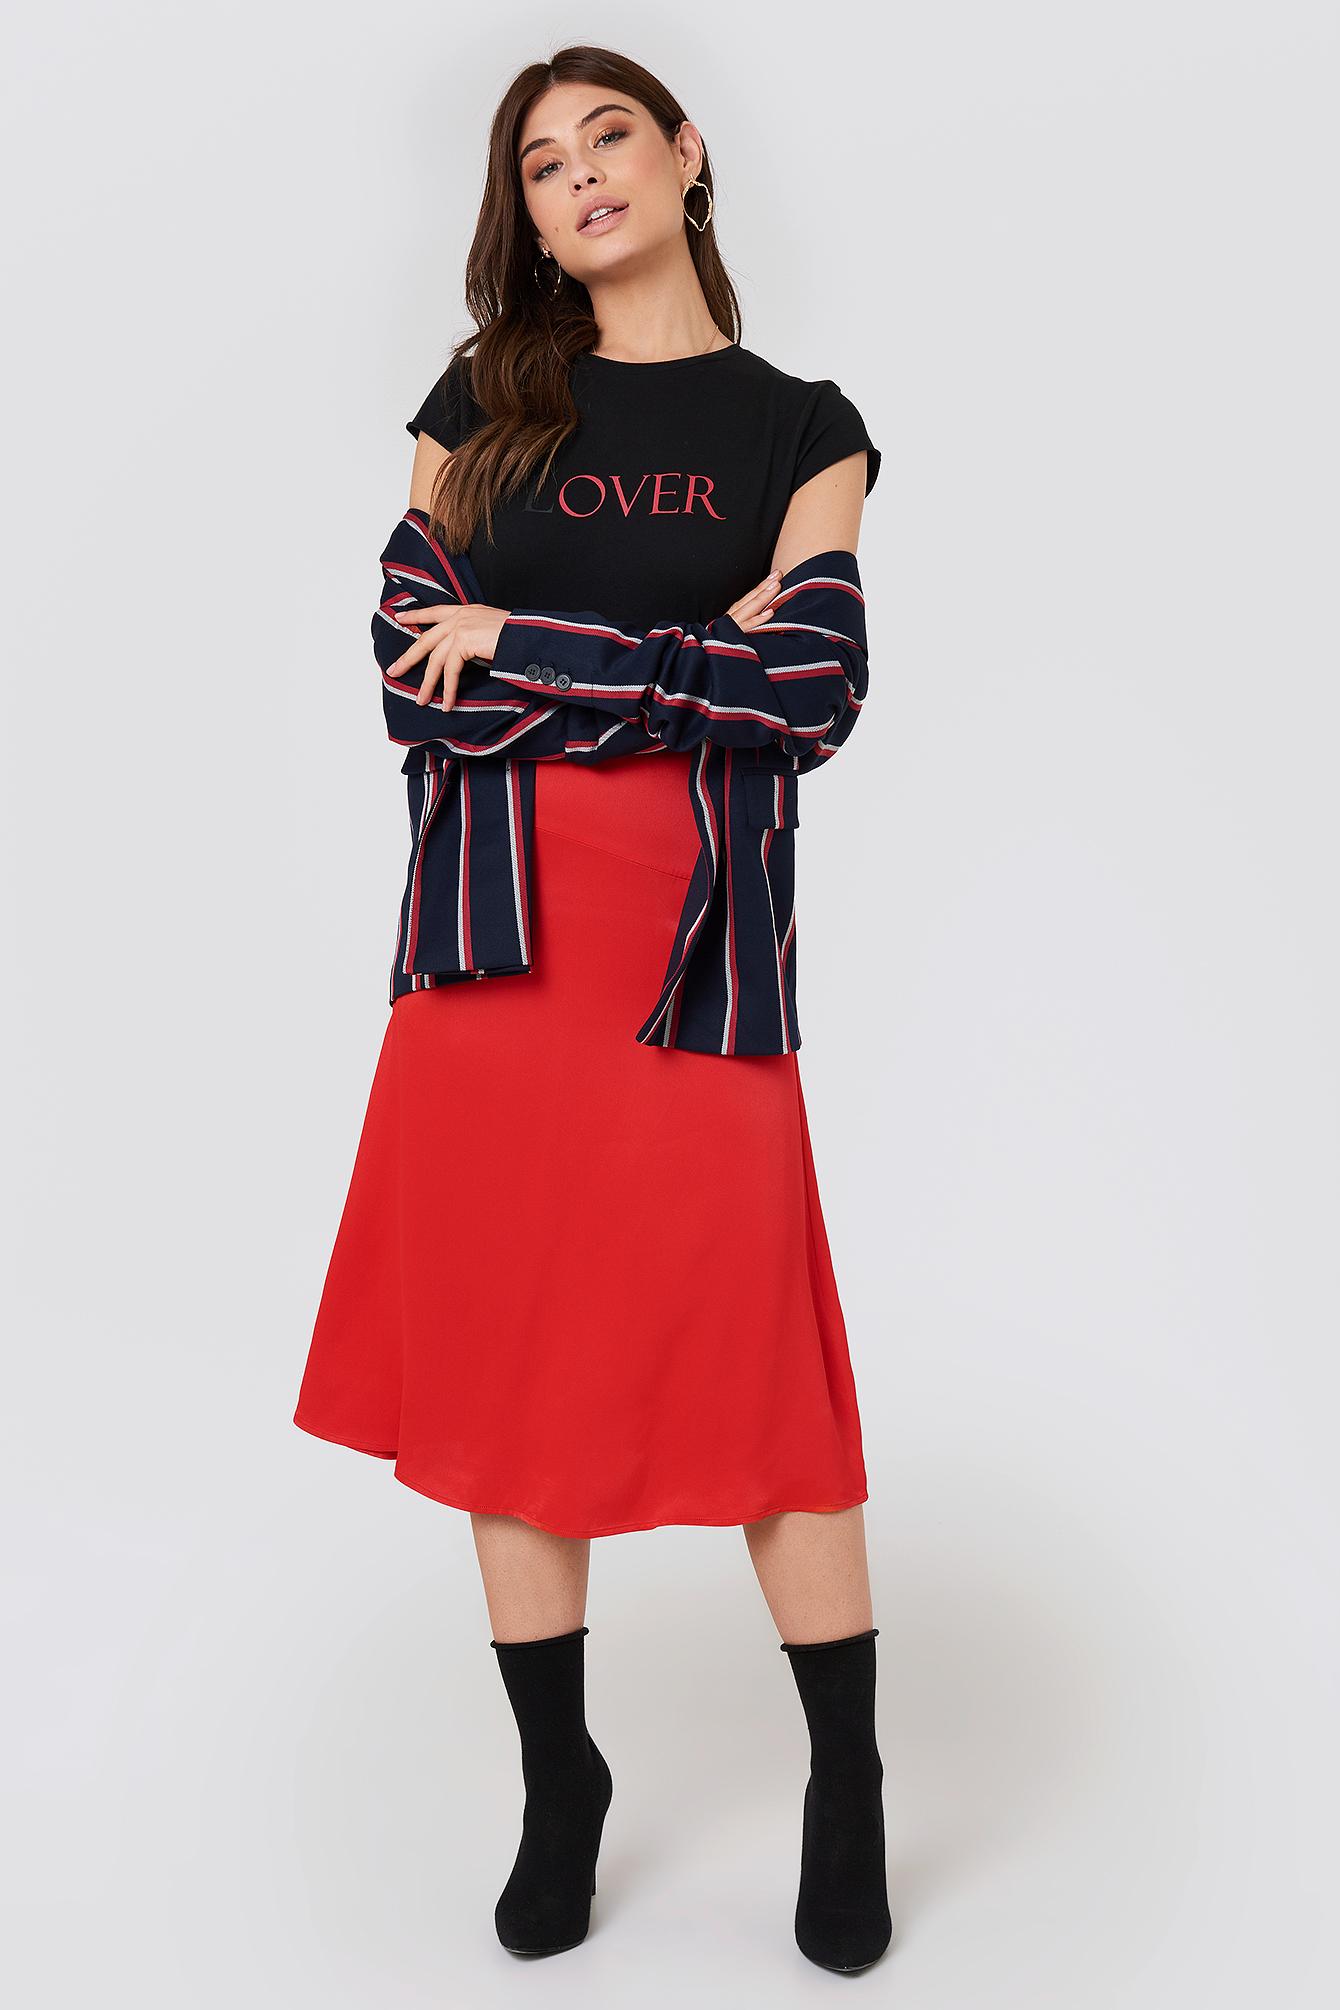 Lover Tee NA-KD.COM